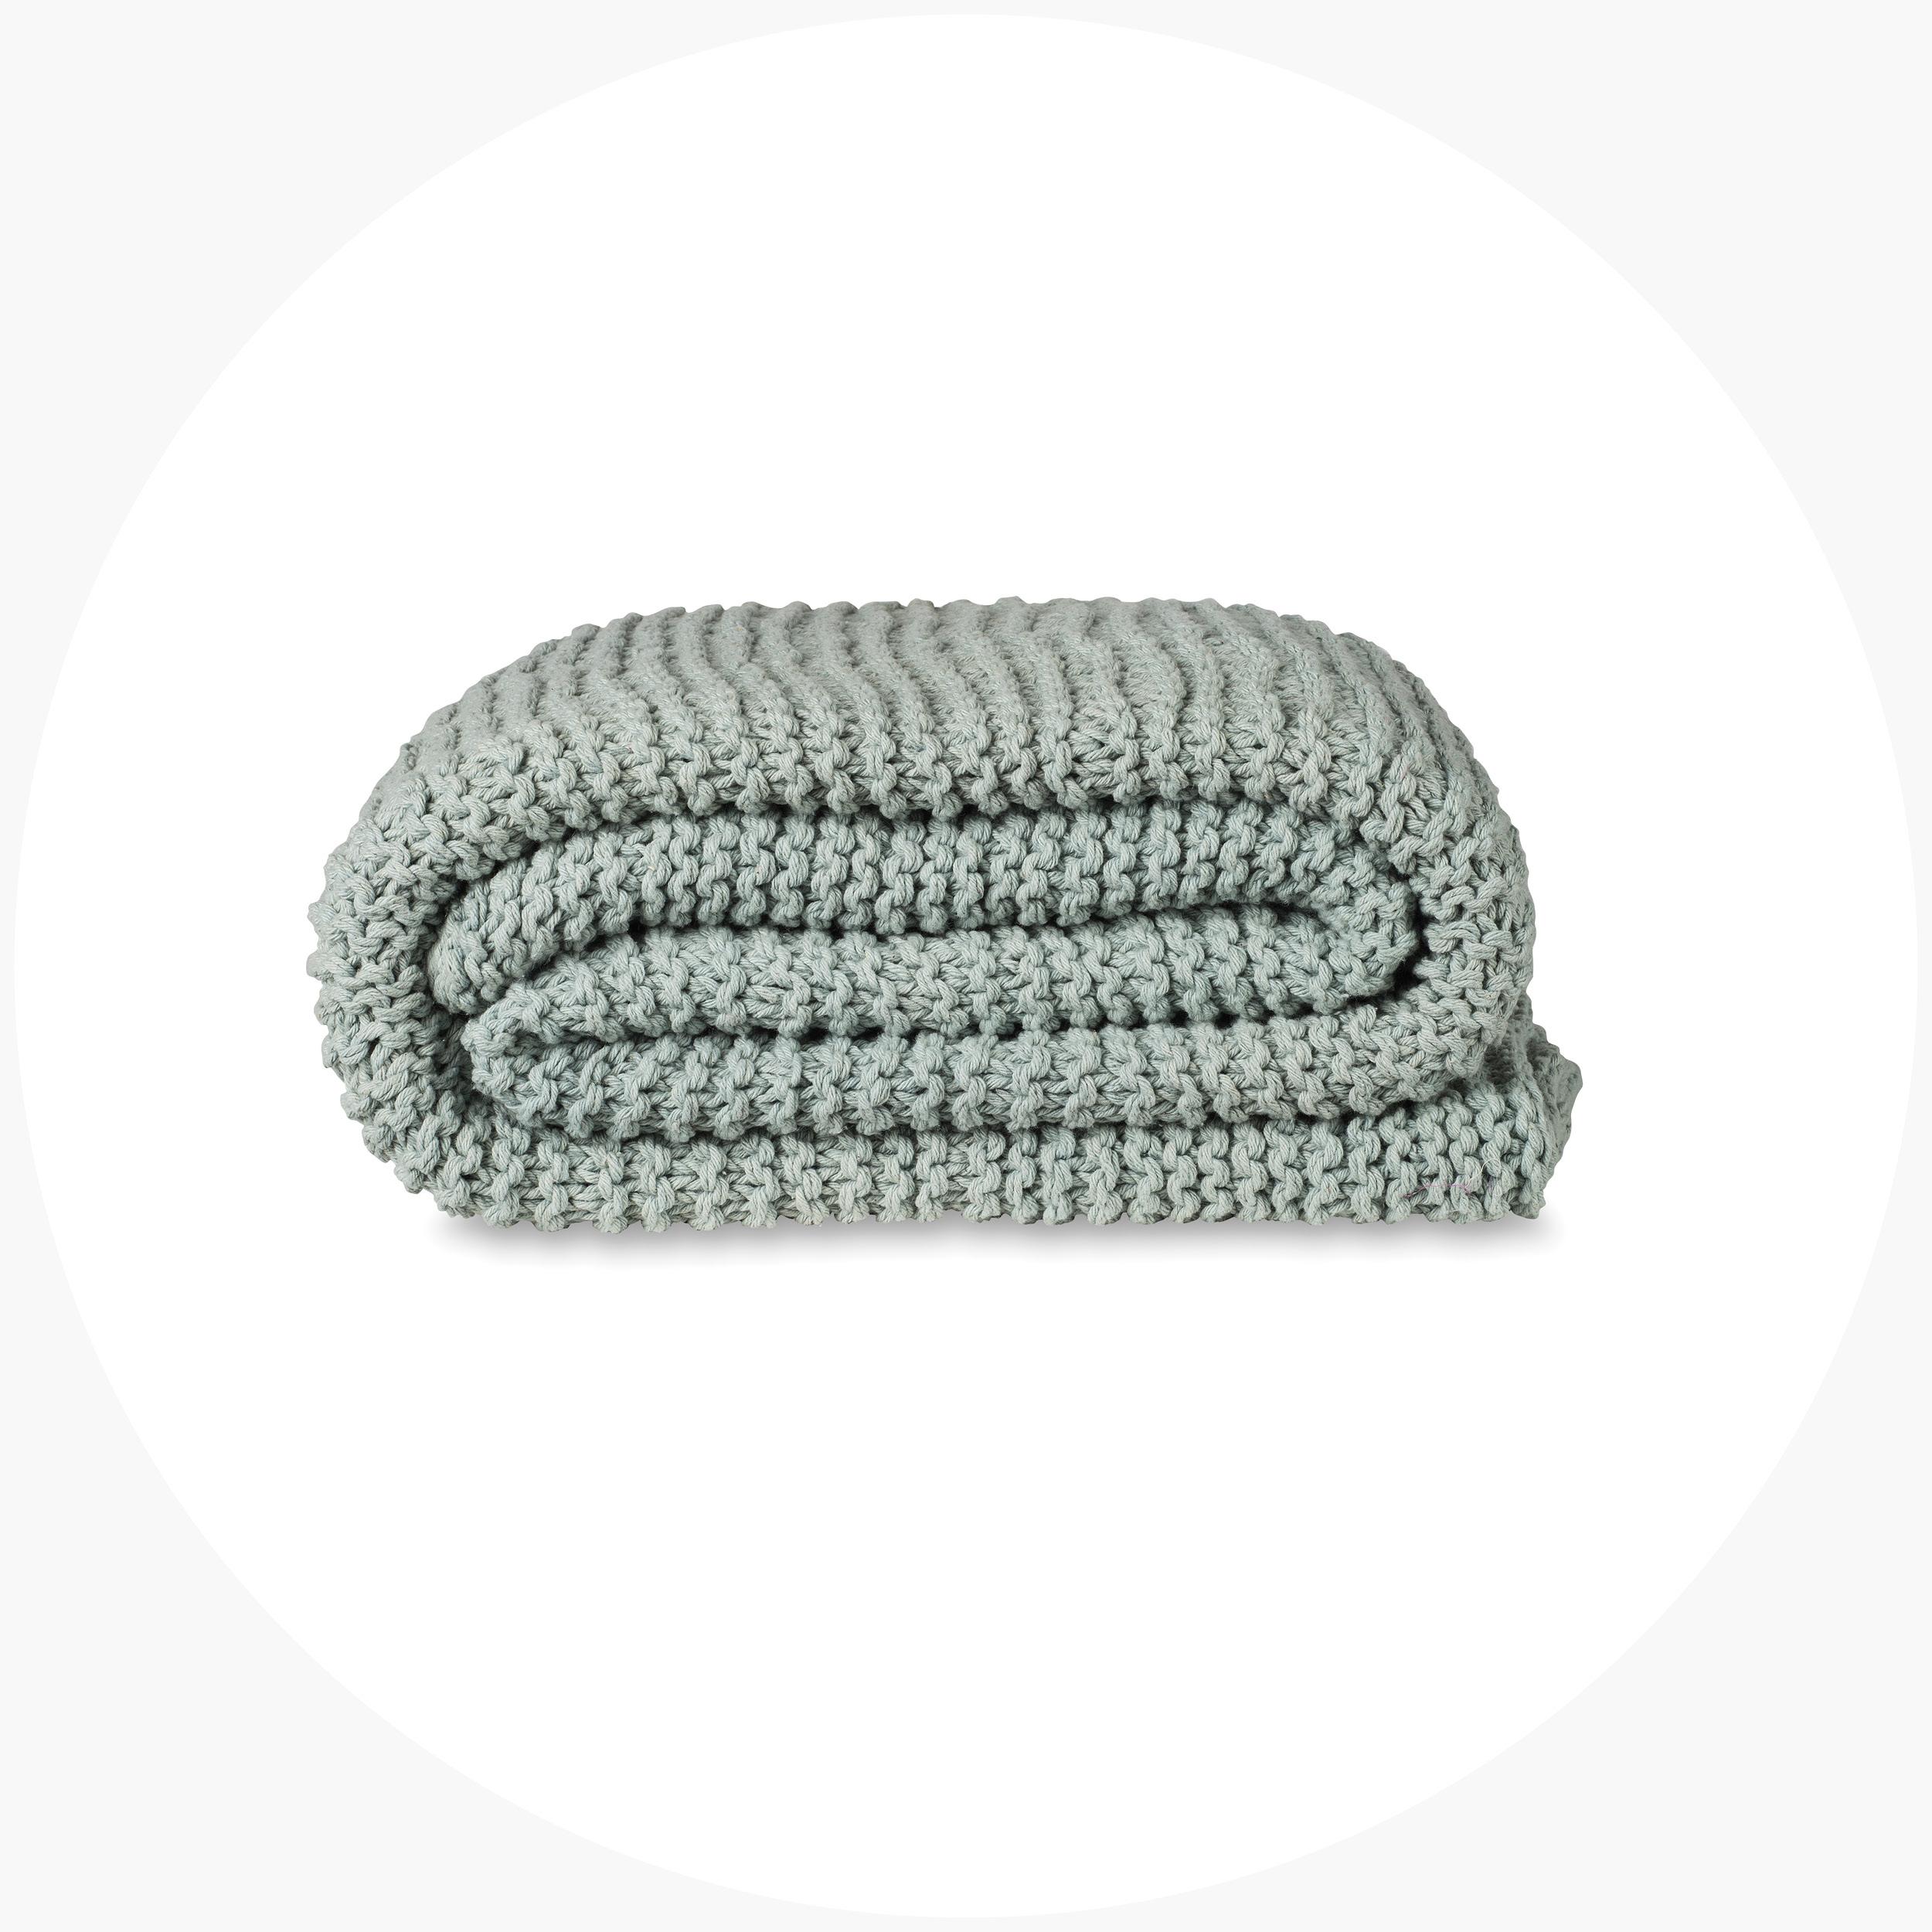 Purl Stitch Cotton Throw  $139.00